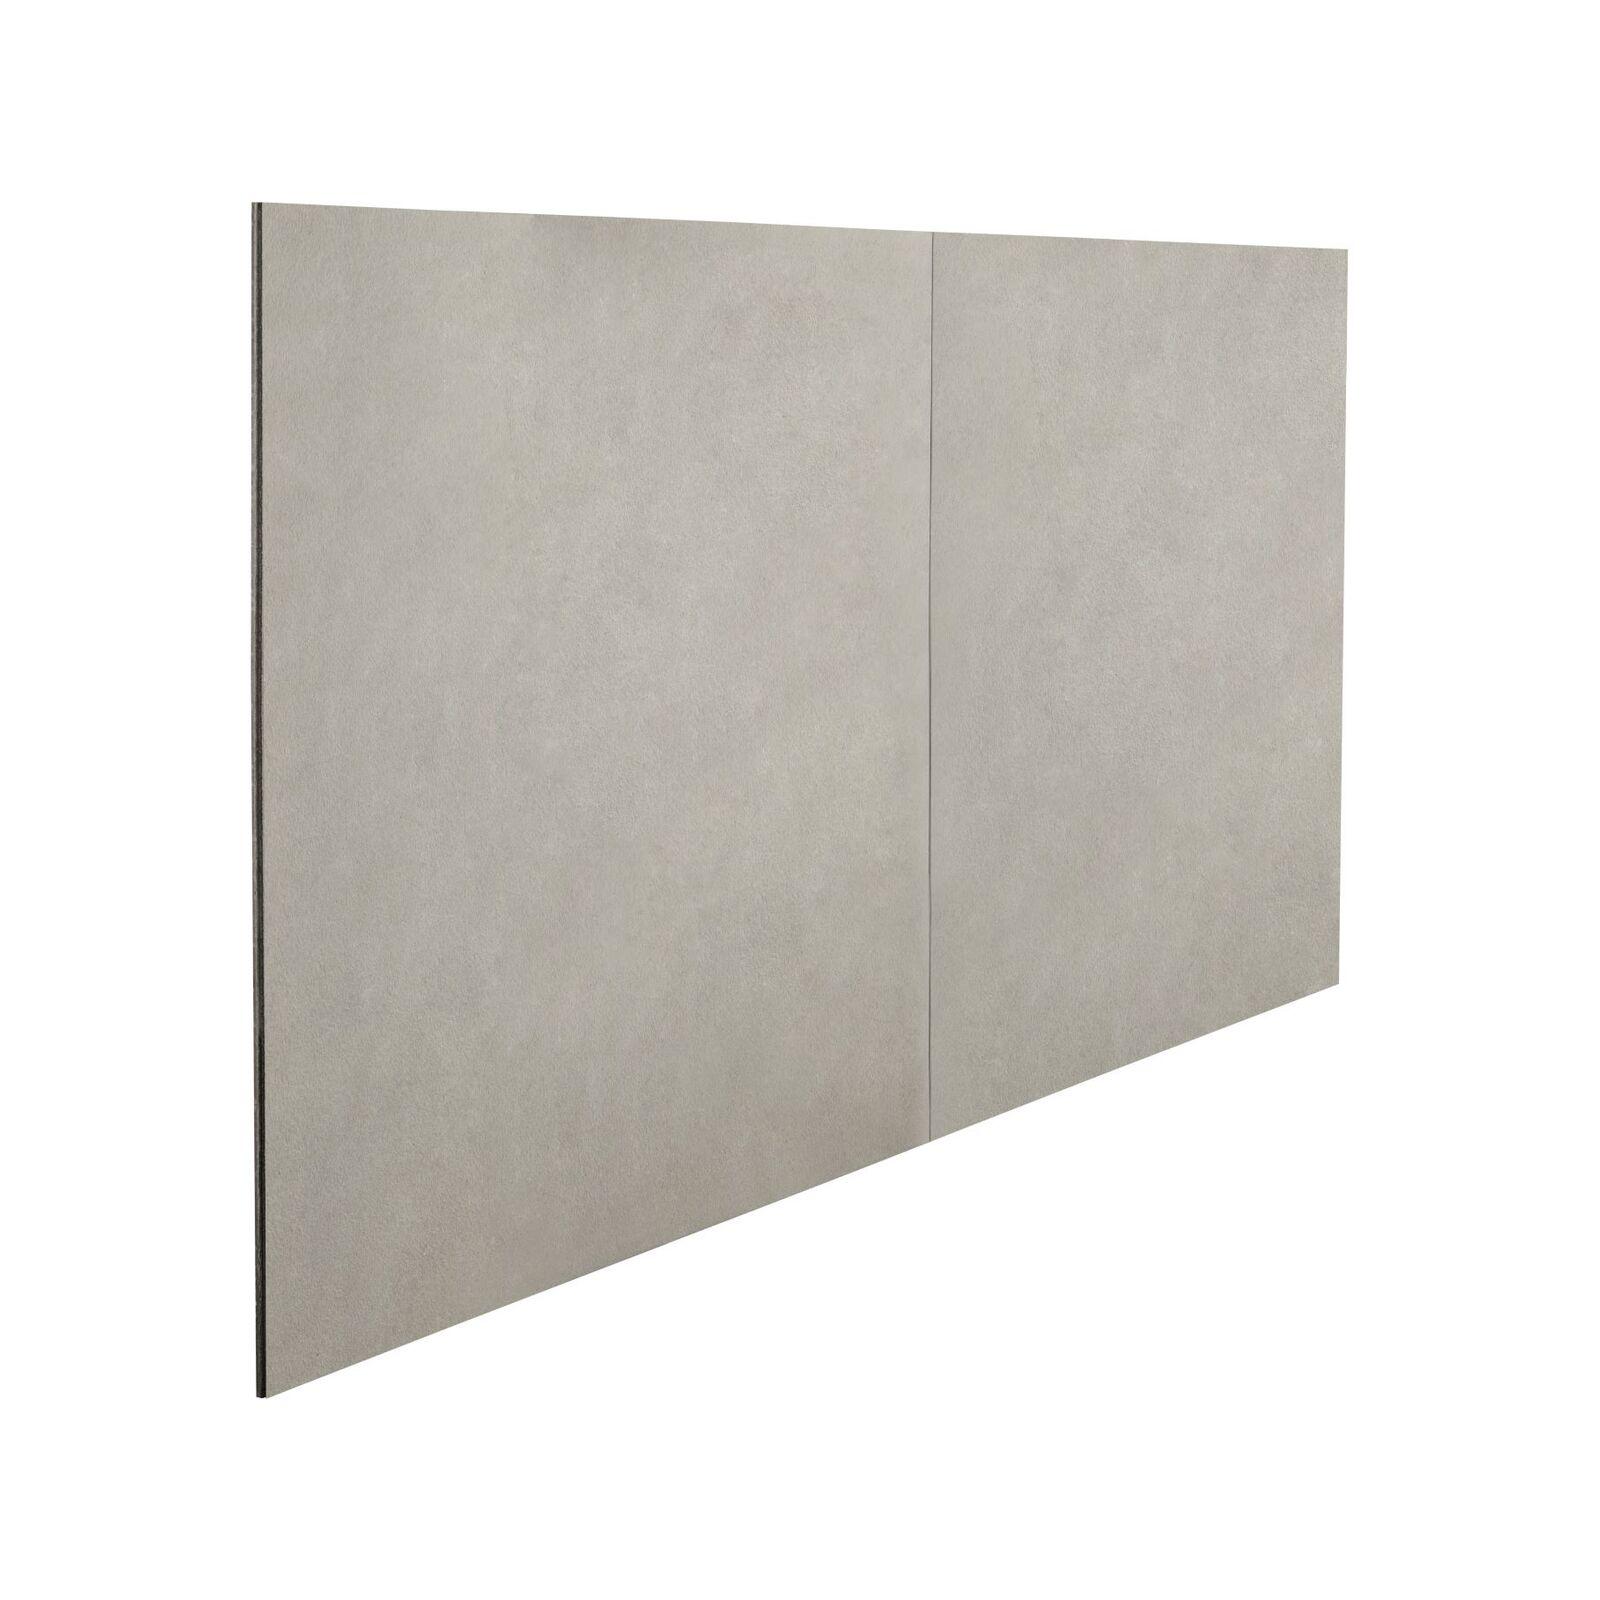 James Hardie 2440 x 1200 x 8.5mm Hardie Fine Texture Cladding